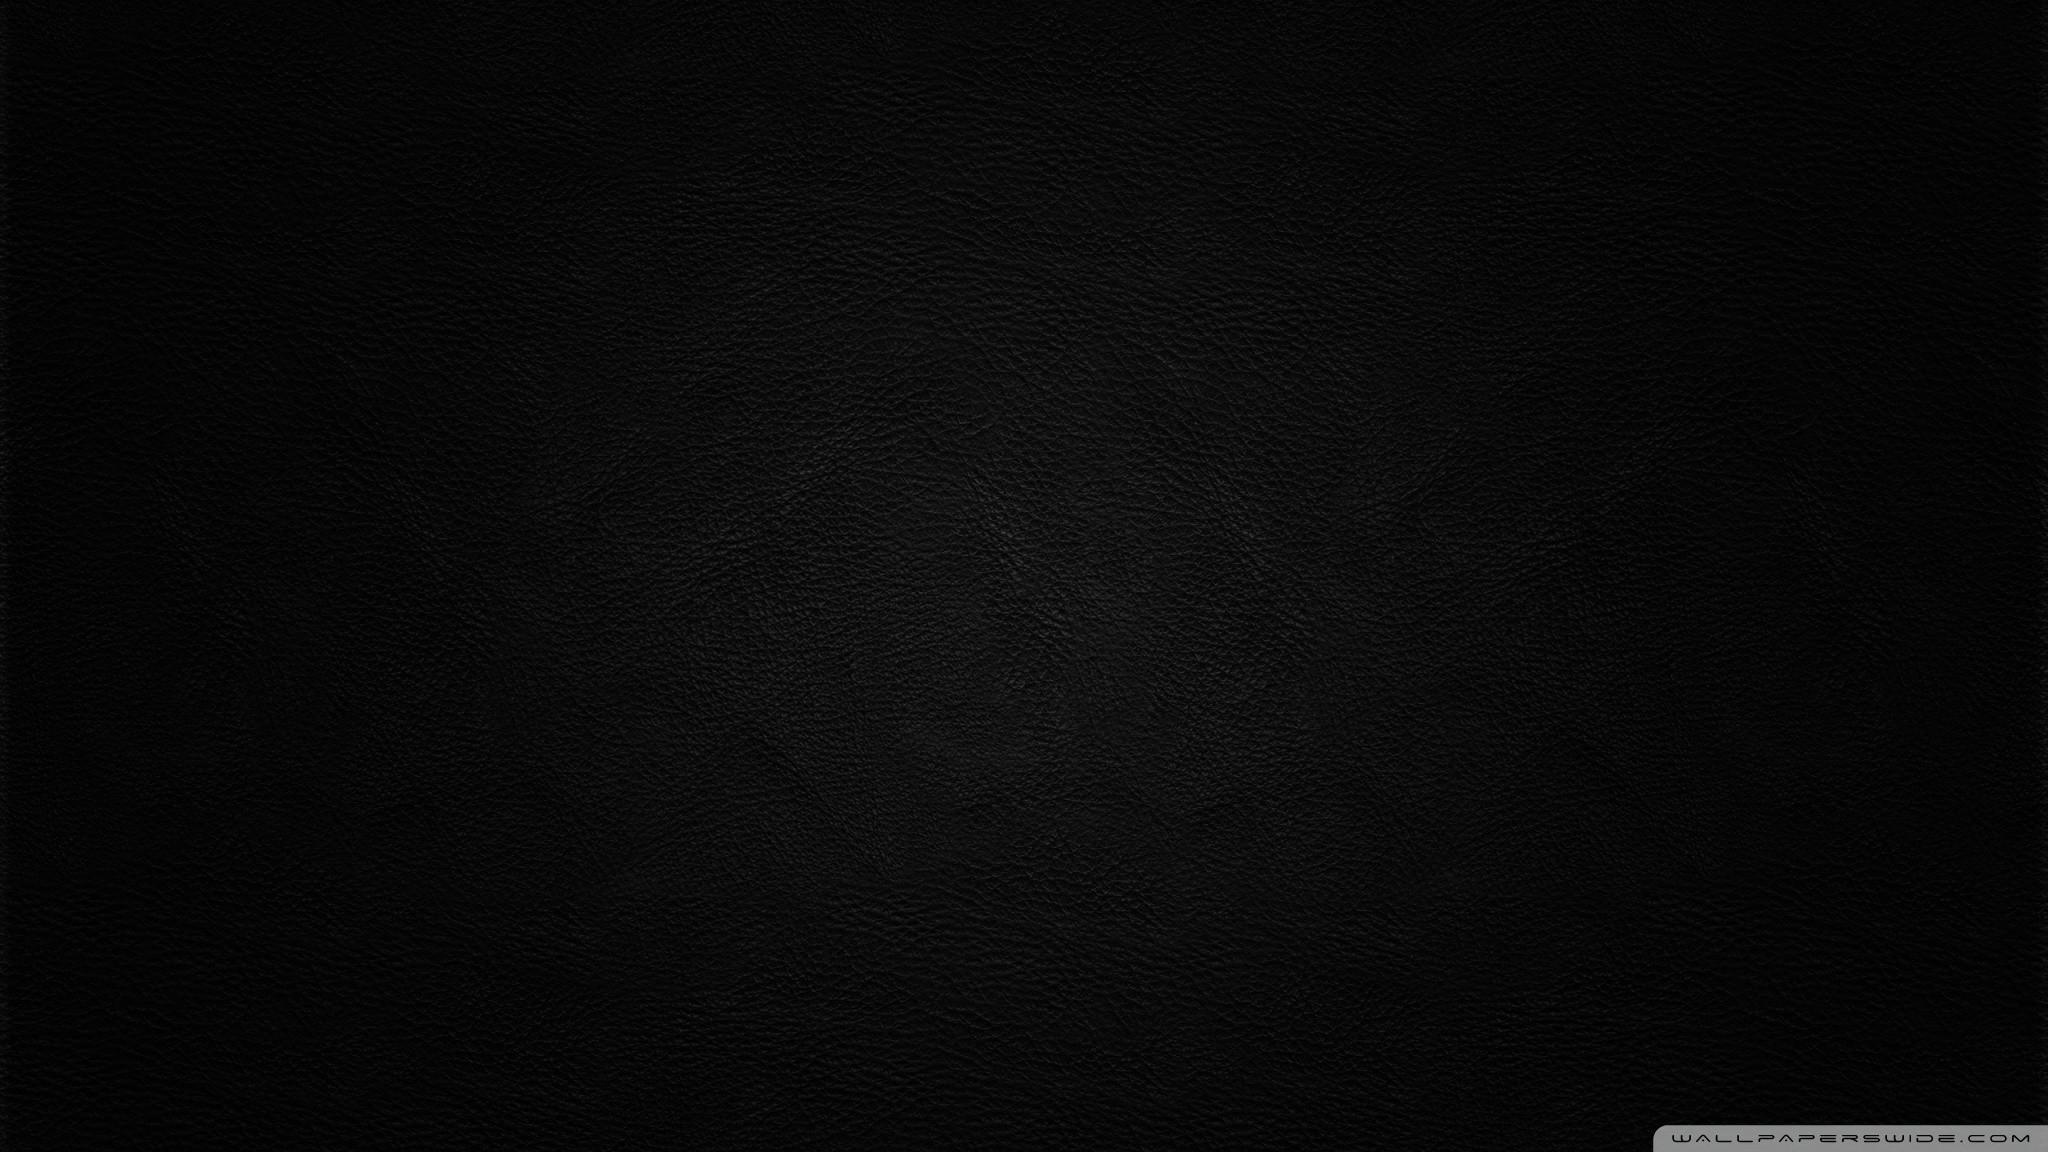 black_background_leather-wallpaper-2048×1152.jpg – Digital Marketing by  Chris Salazar